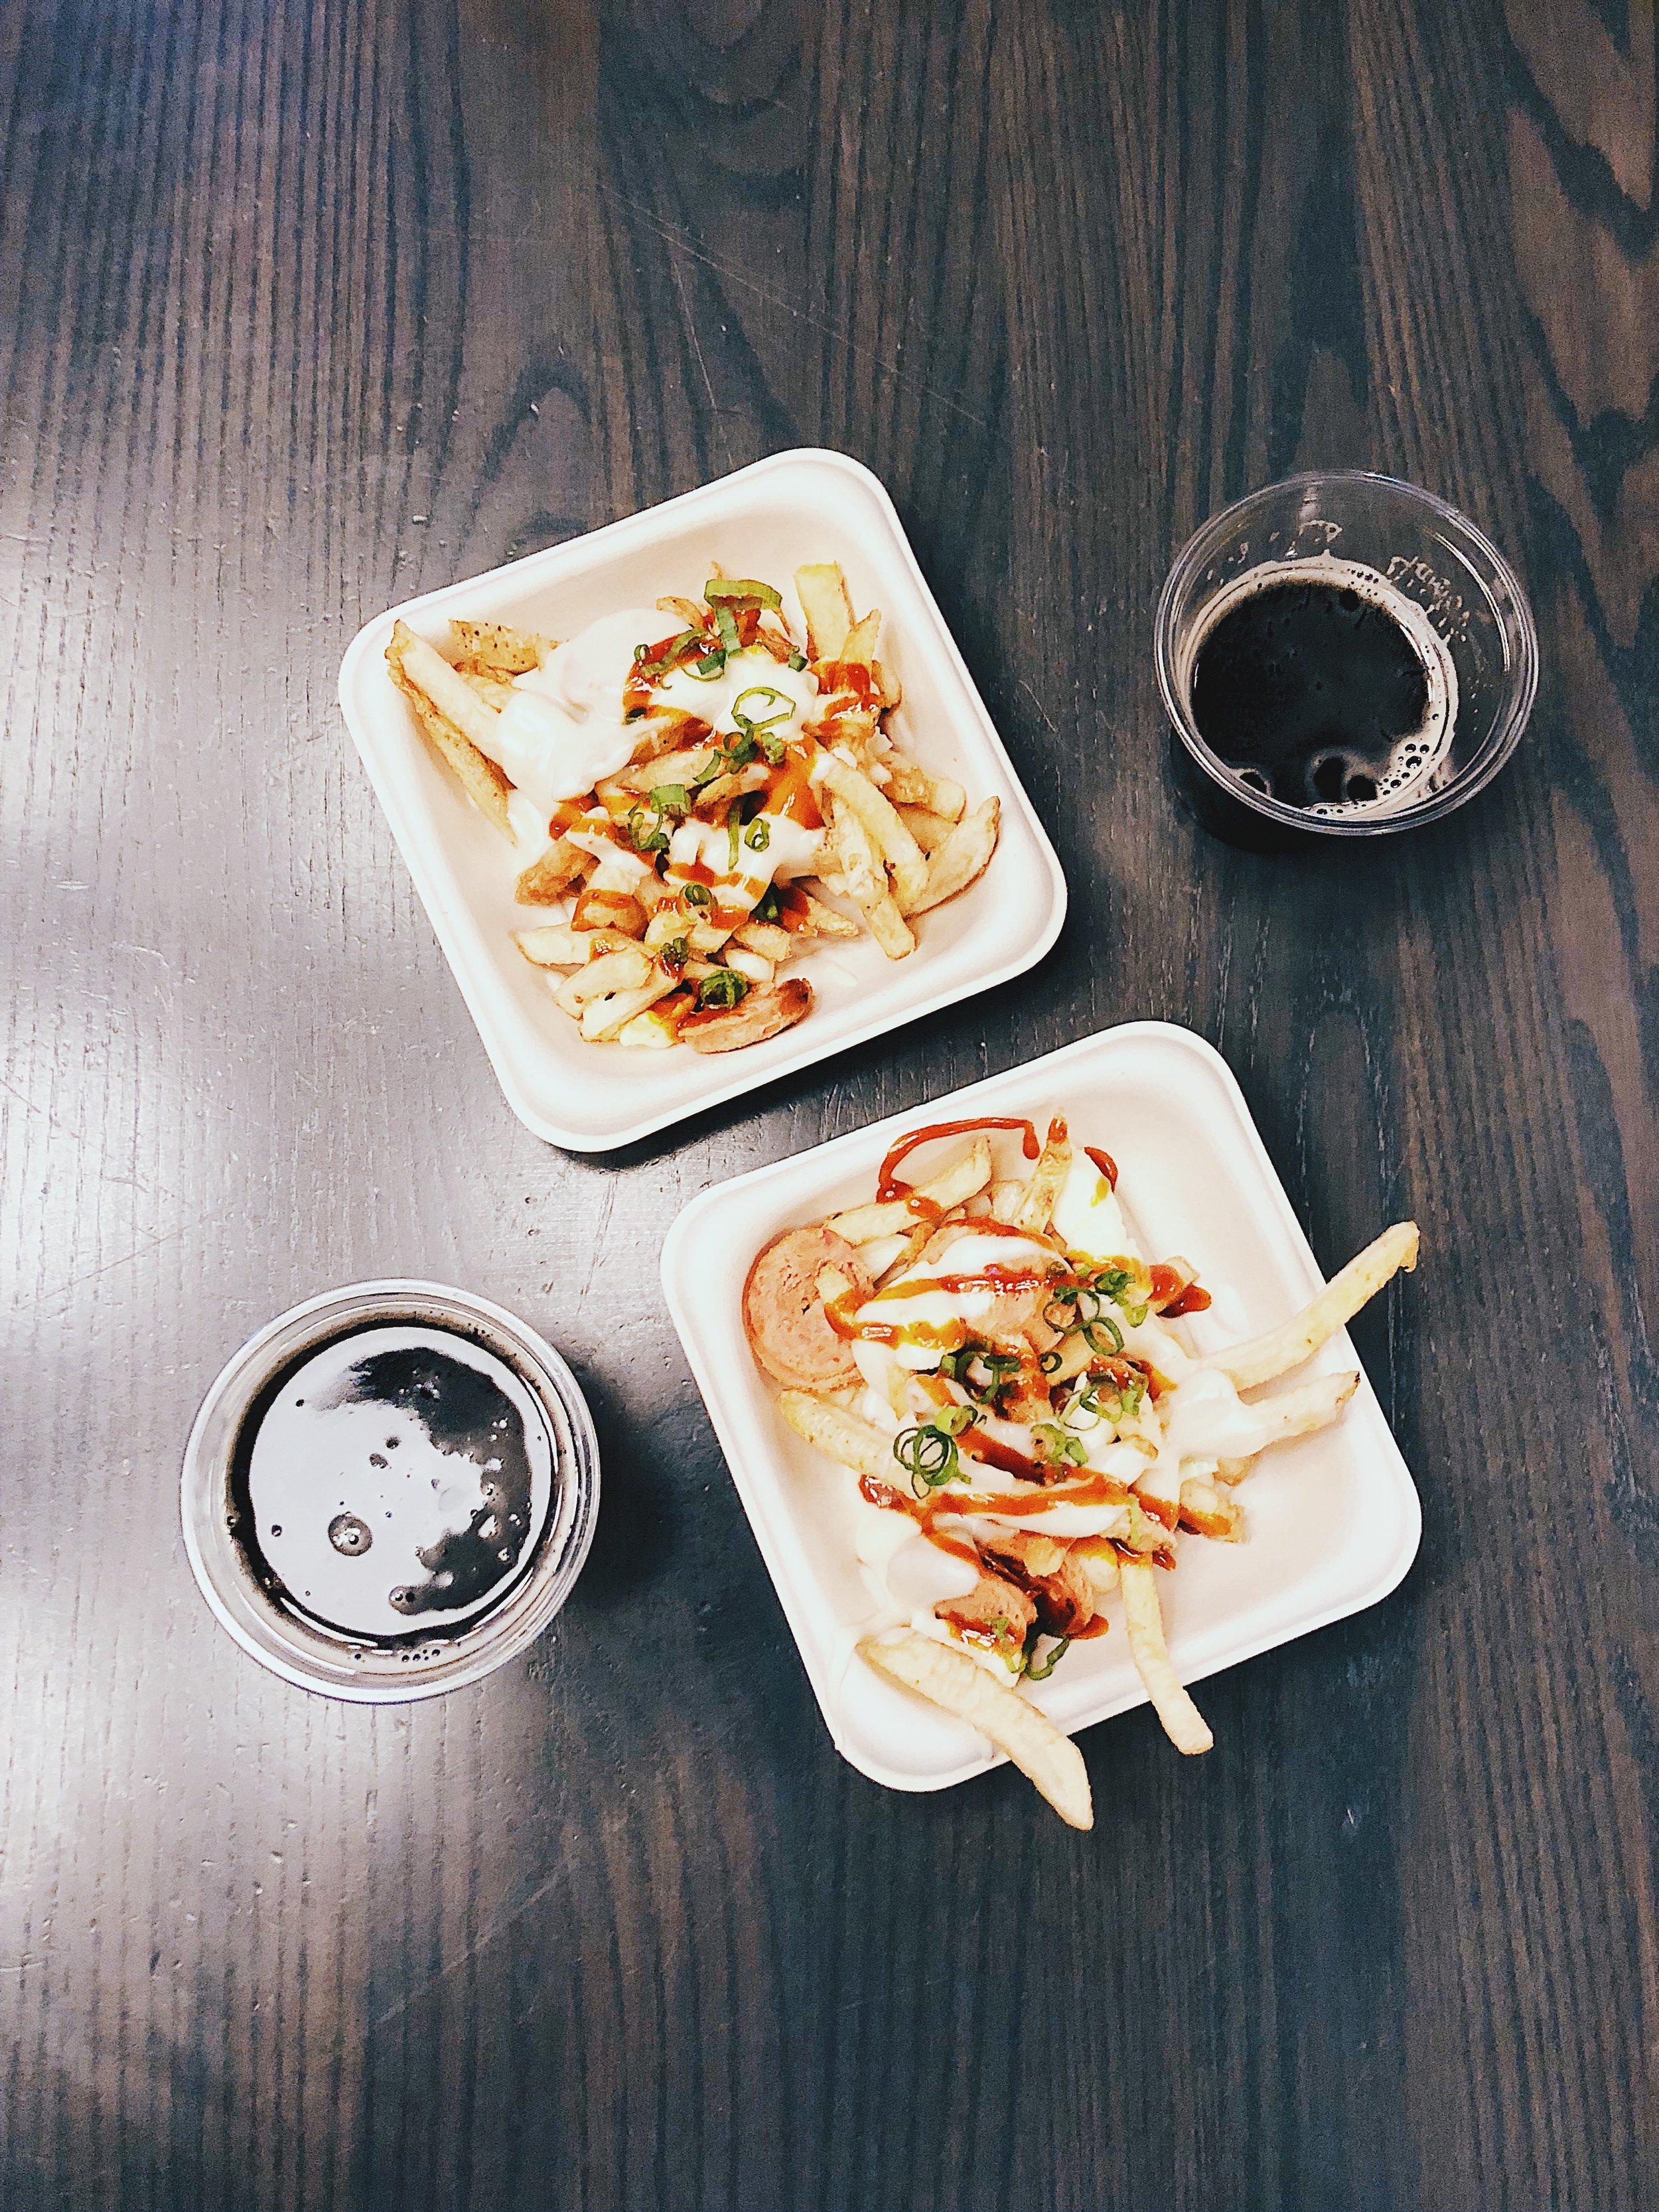 K-Pop Poutine  - twice cooked fries, Korean style chorizo, brie gravy,Brewsters Hawaiian Coconut Porter, gochujang ketchup